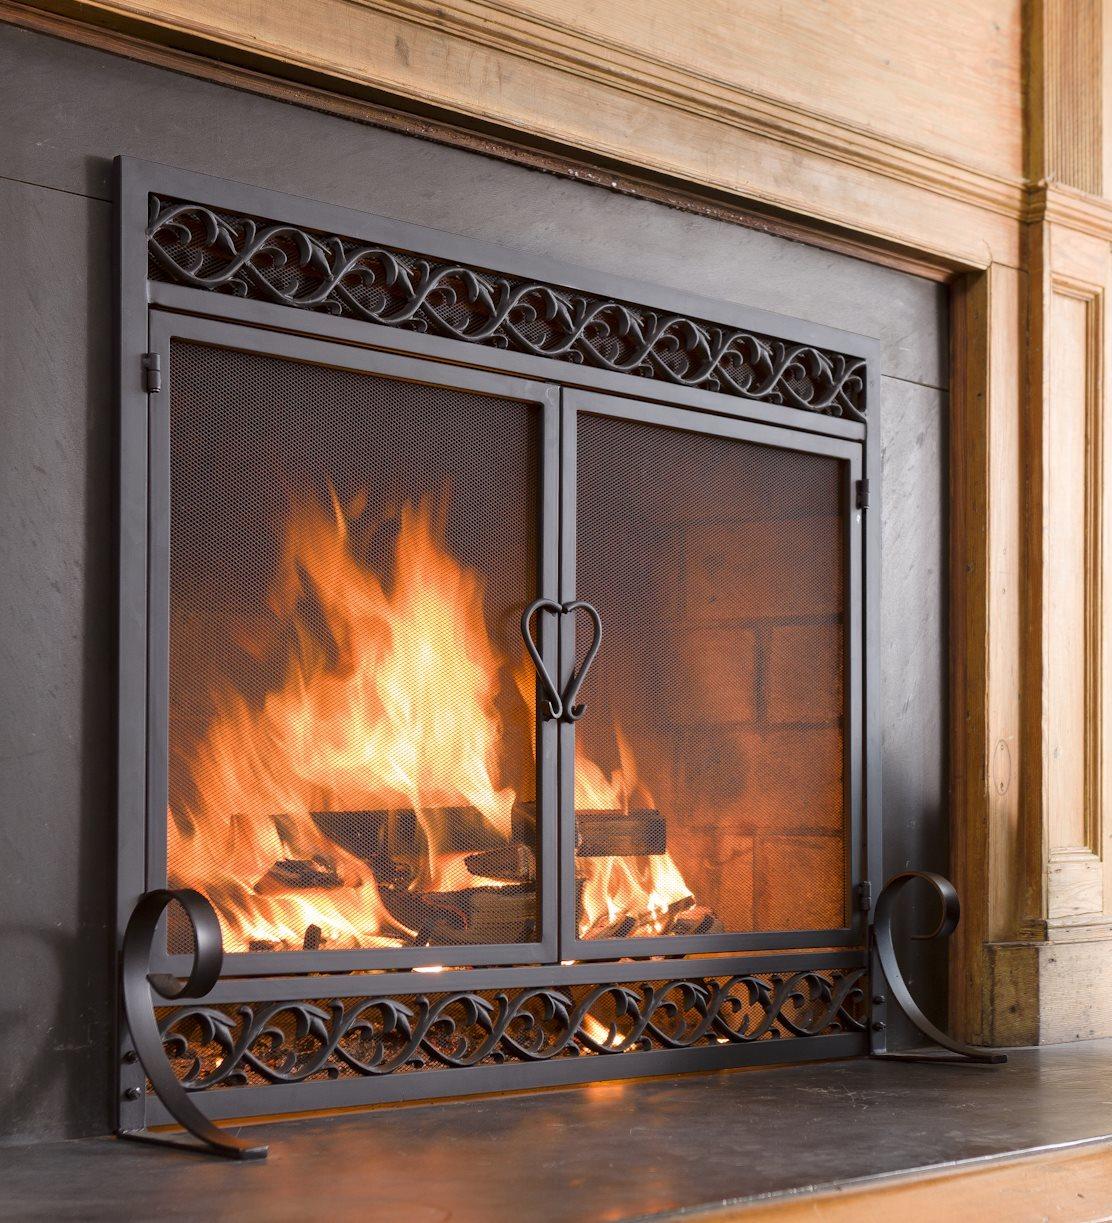 Small Cast Iron Scrollwork Fireplace Screen W Doors In Black